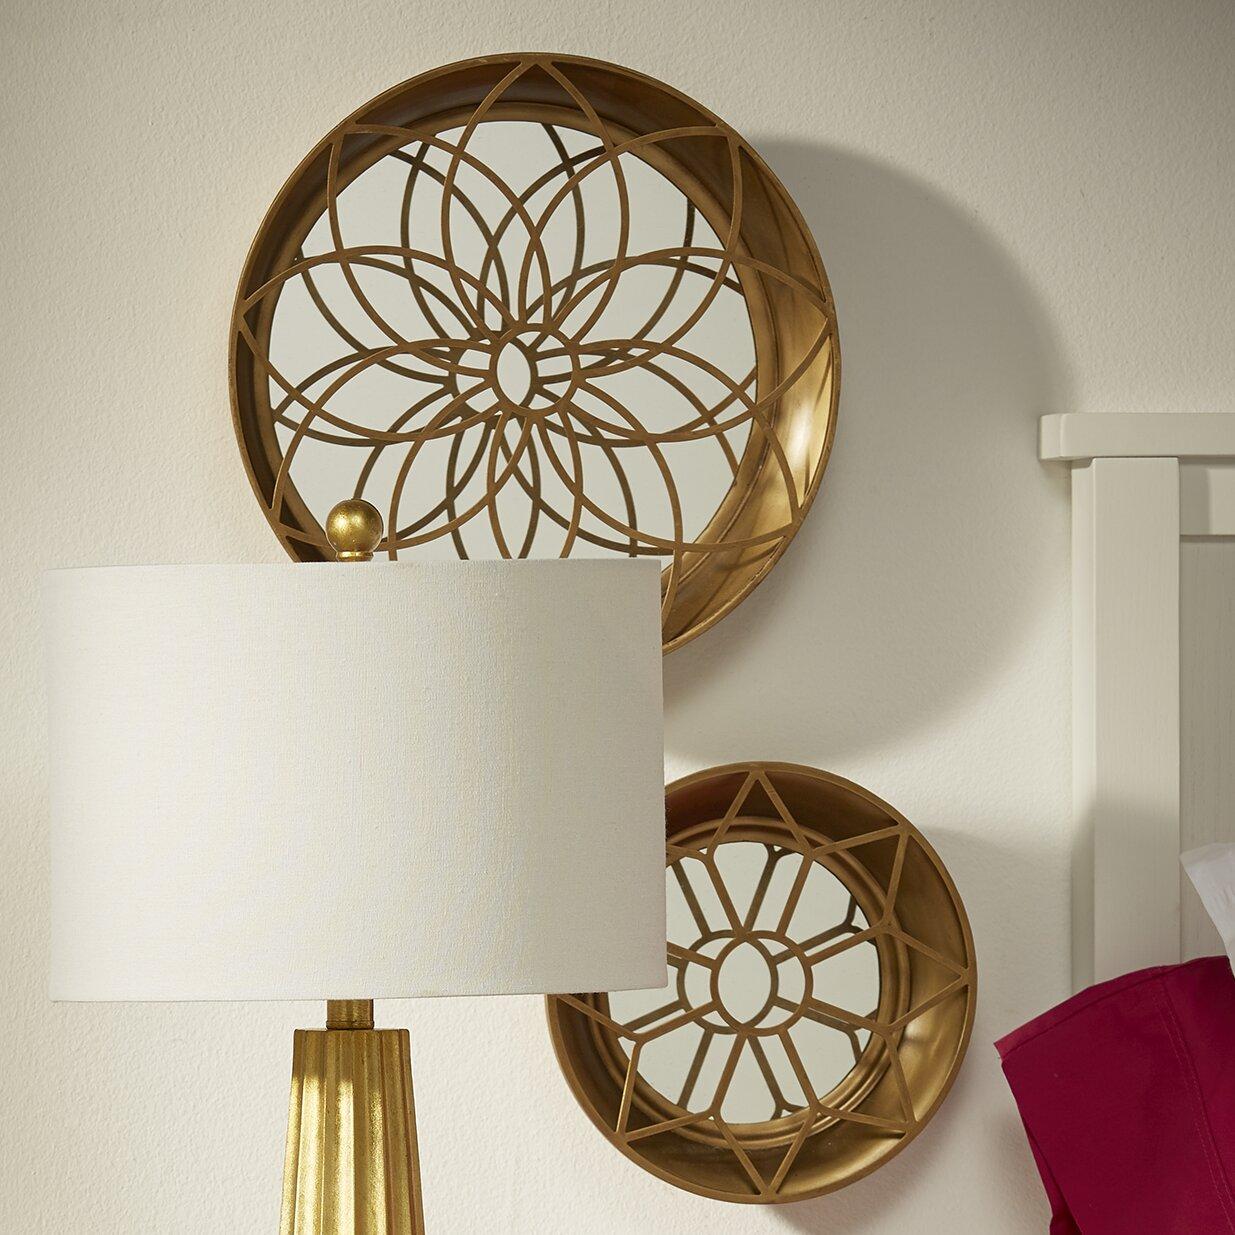 3 Piece Hanging Mirror Wall Decor Set & Reviews | AllModern